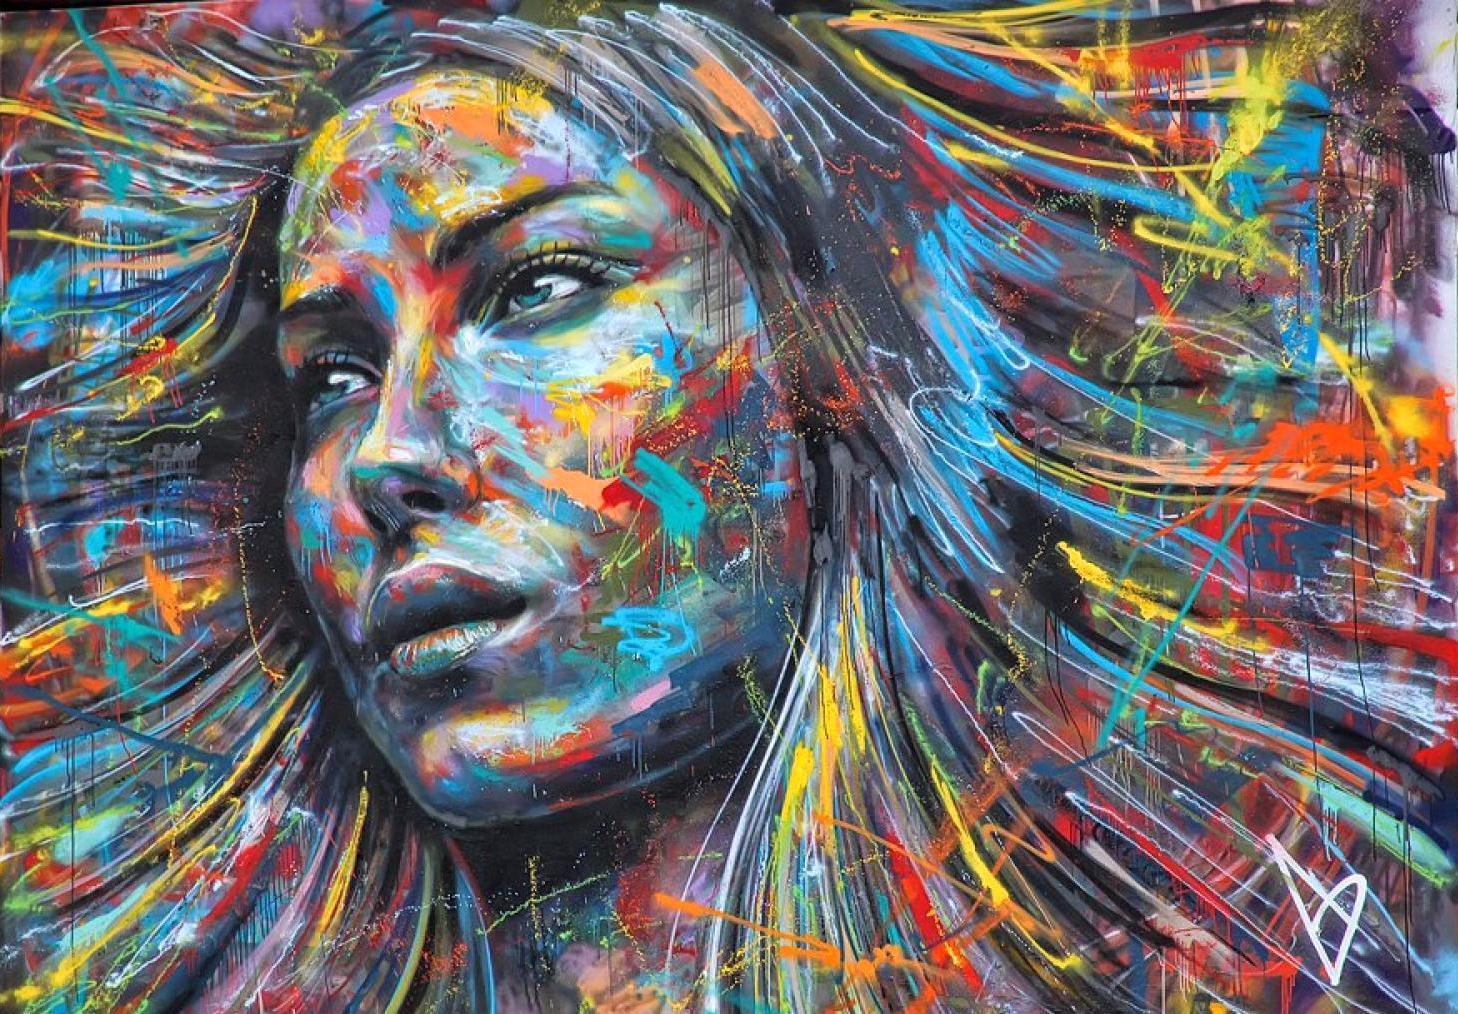 Street Art,  David Walker  - Picture by Jun Tuazon